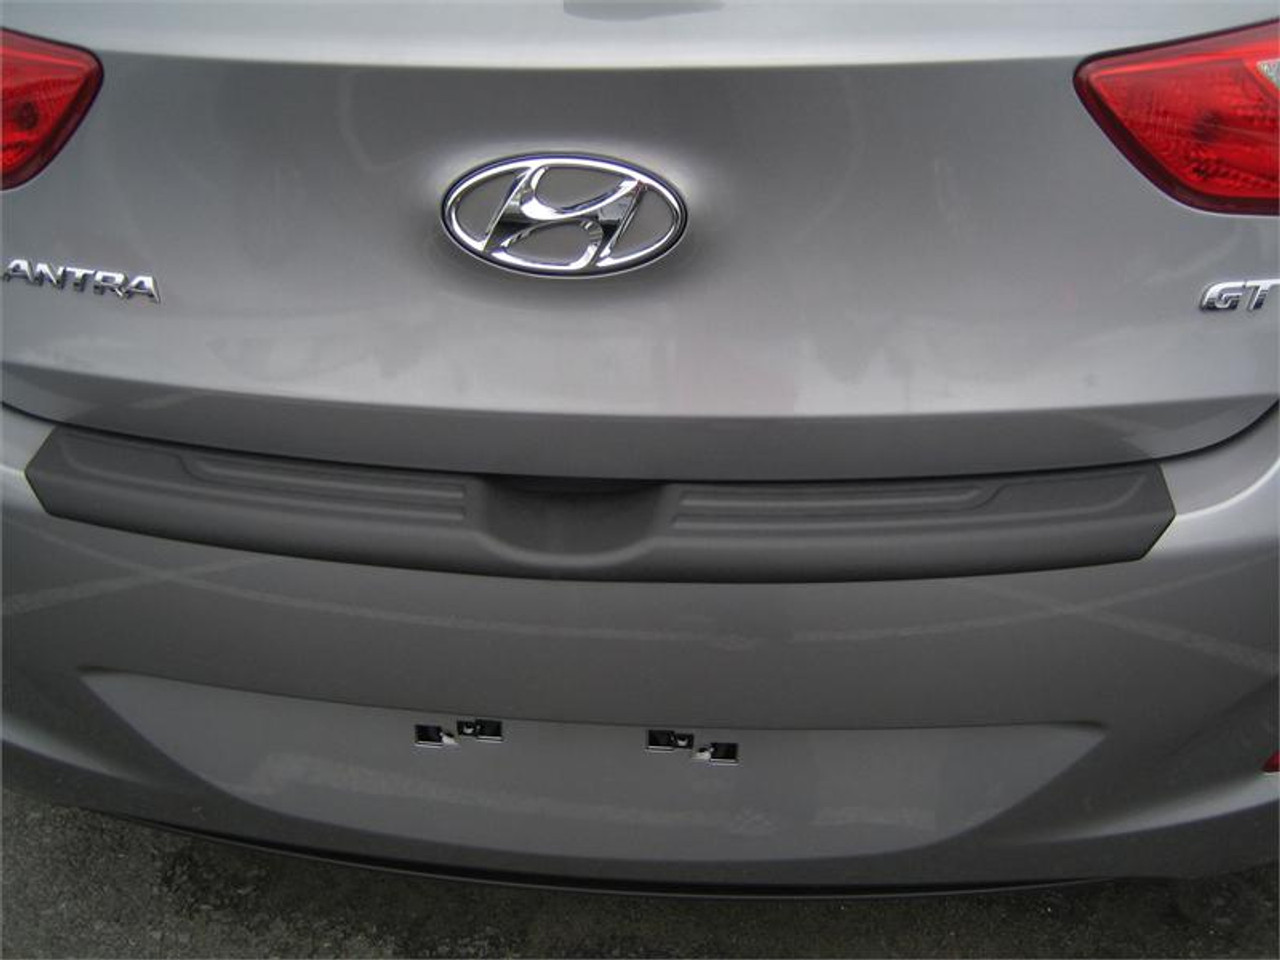 2013 2017 Hyundai Elantra Gt Rear Bumper Protector Free